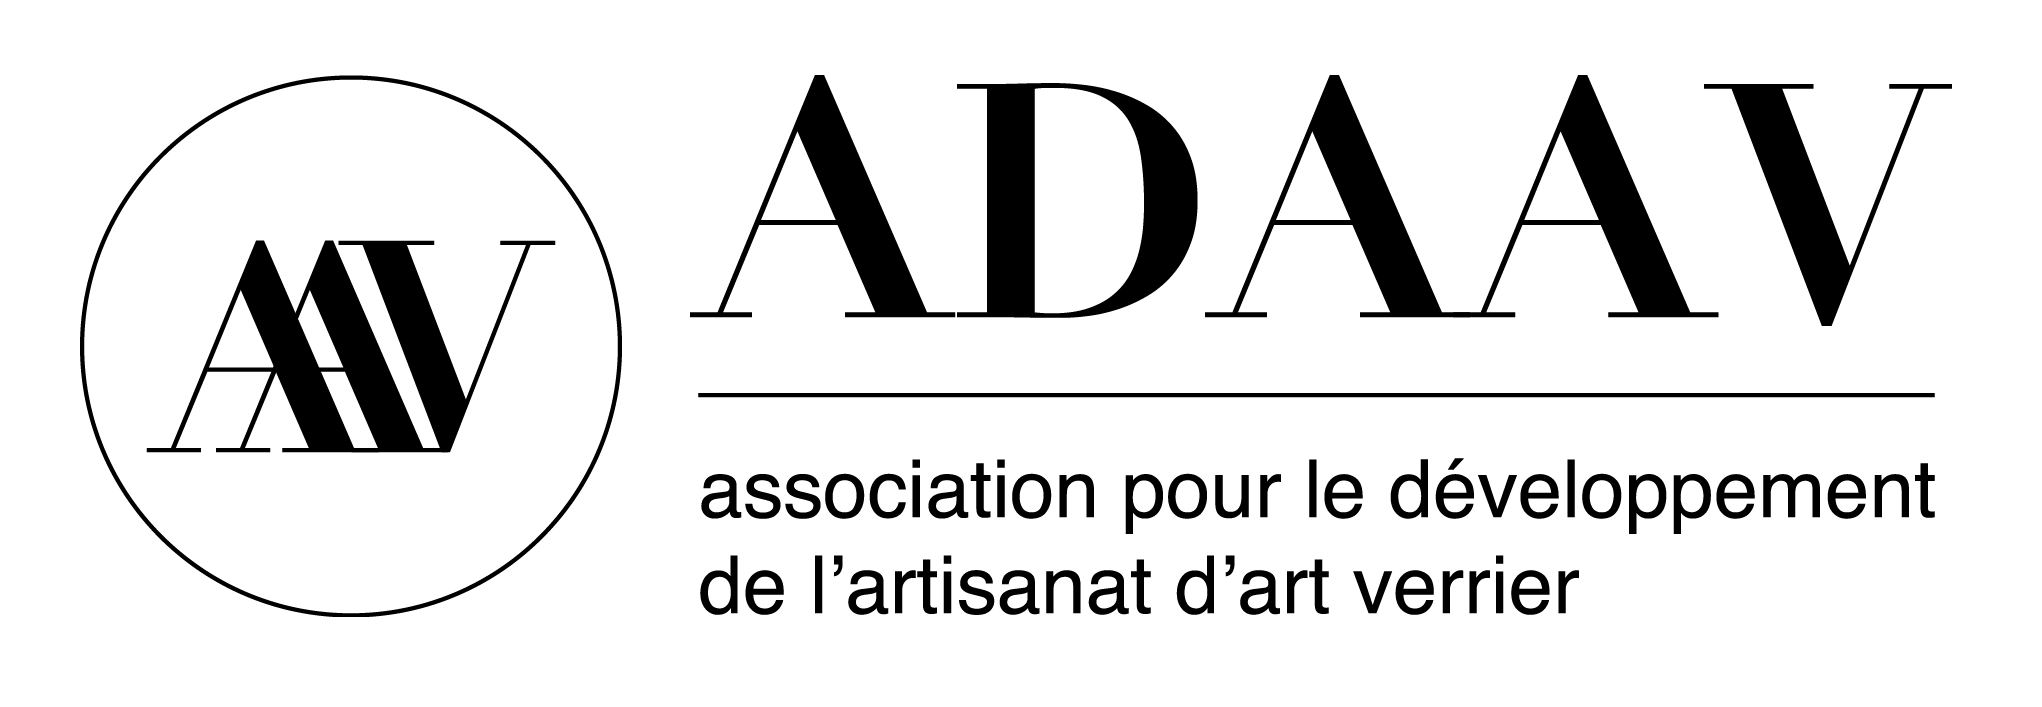 ADAAV